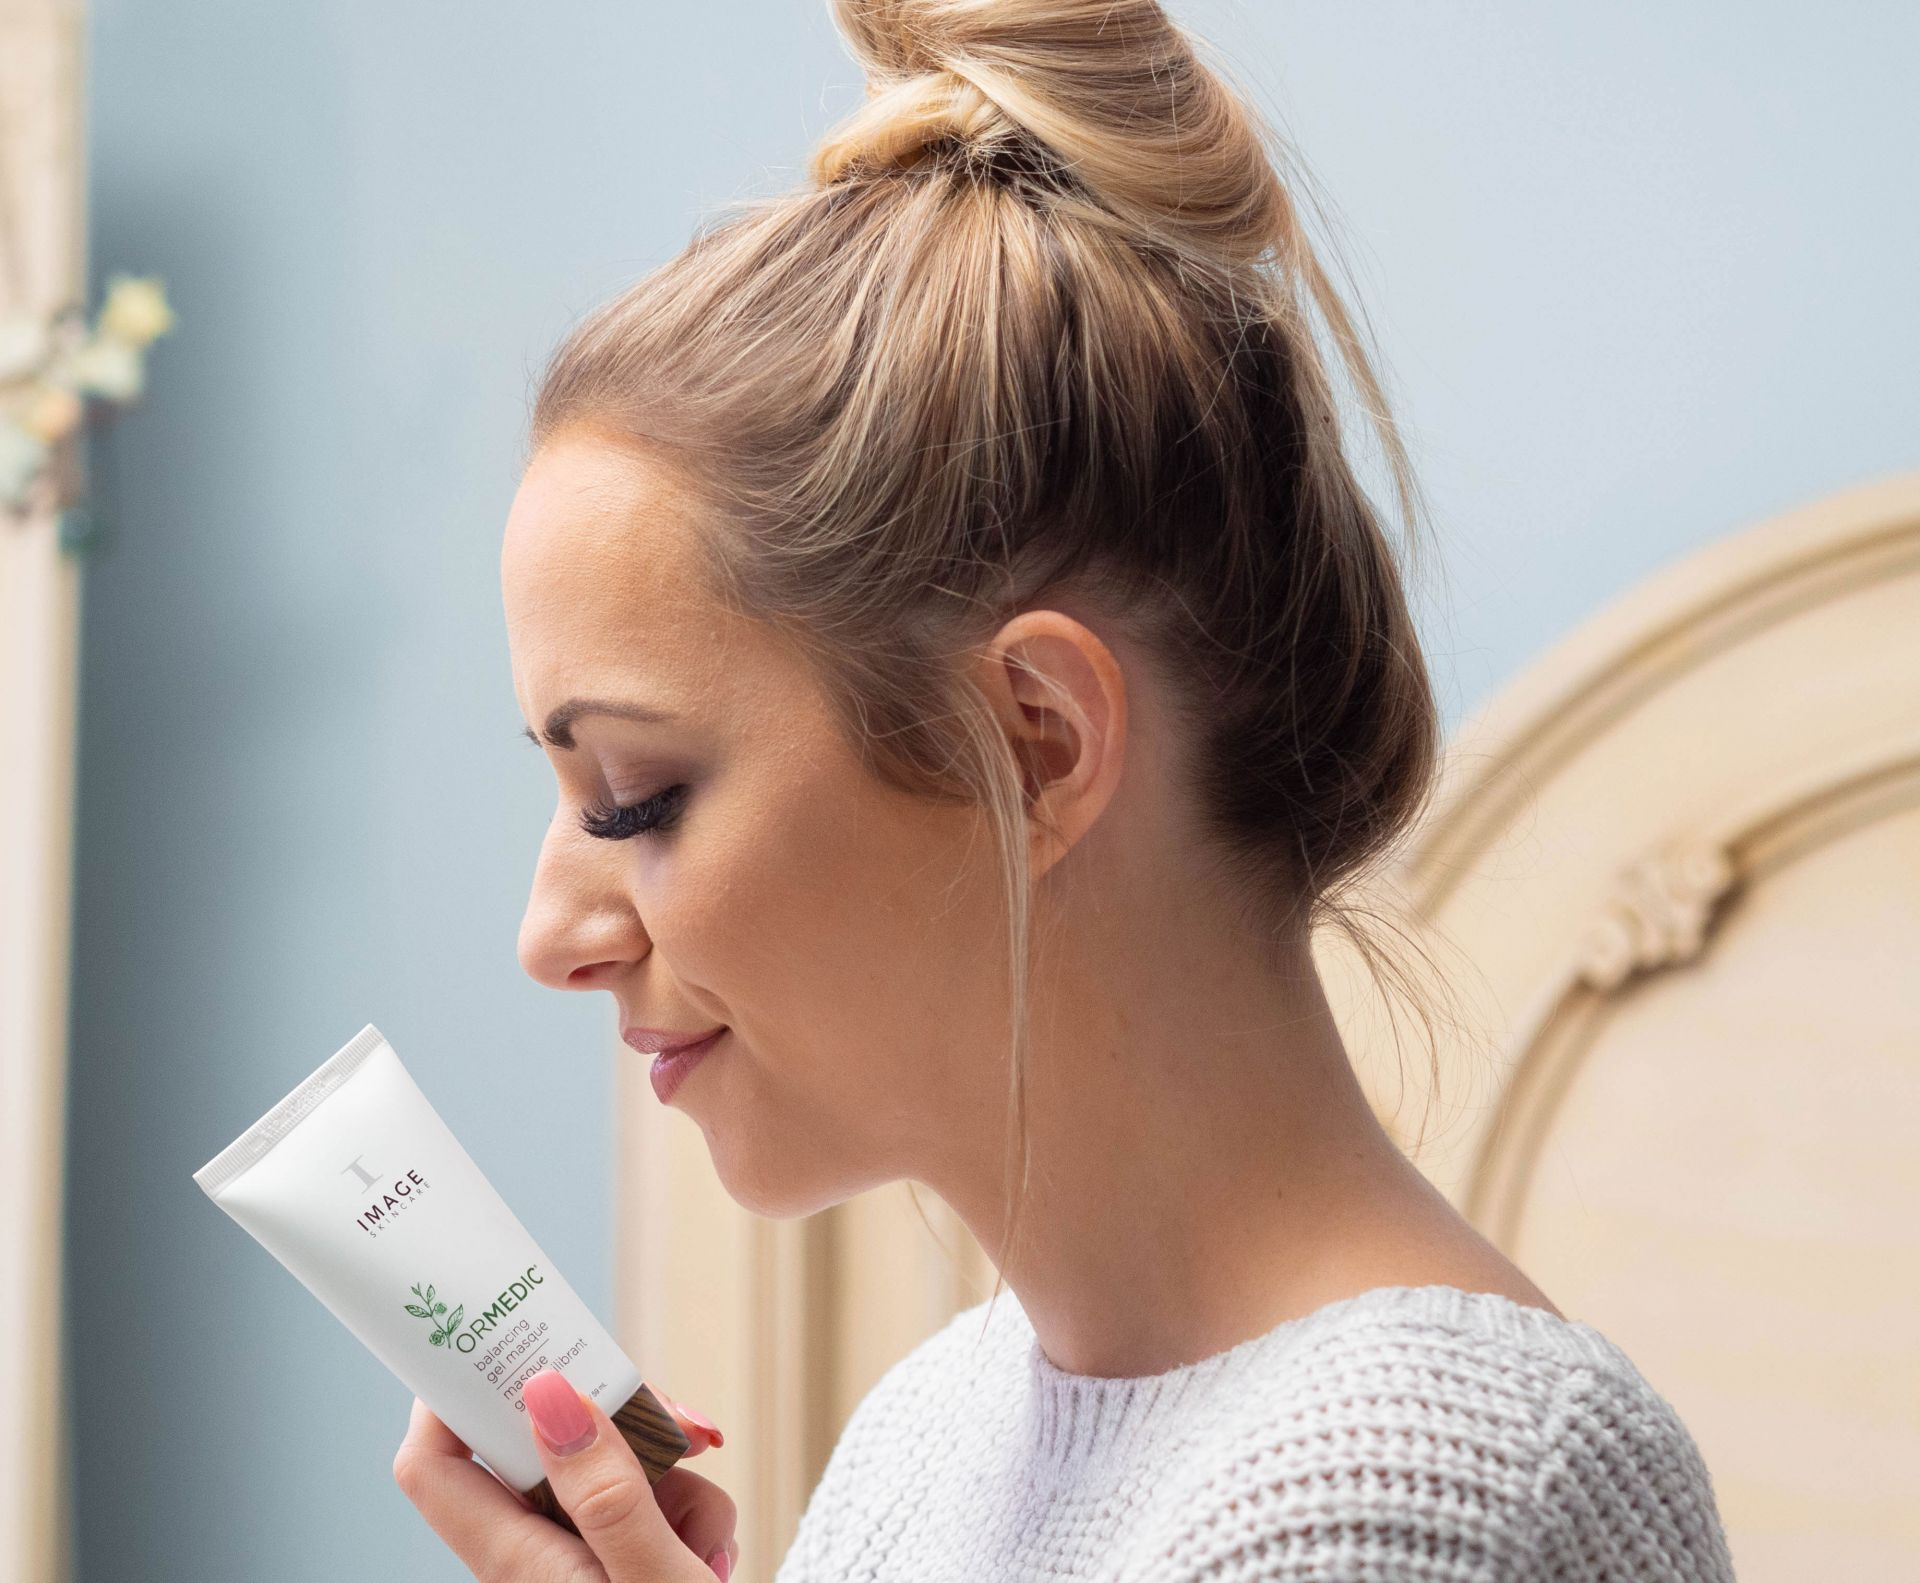 Image Ormedic skincare review